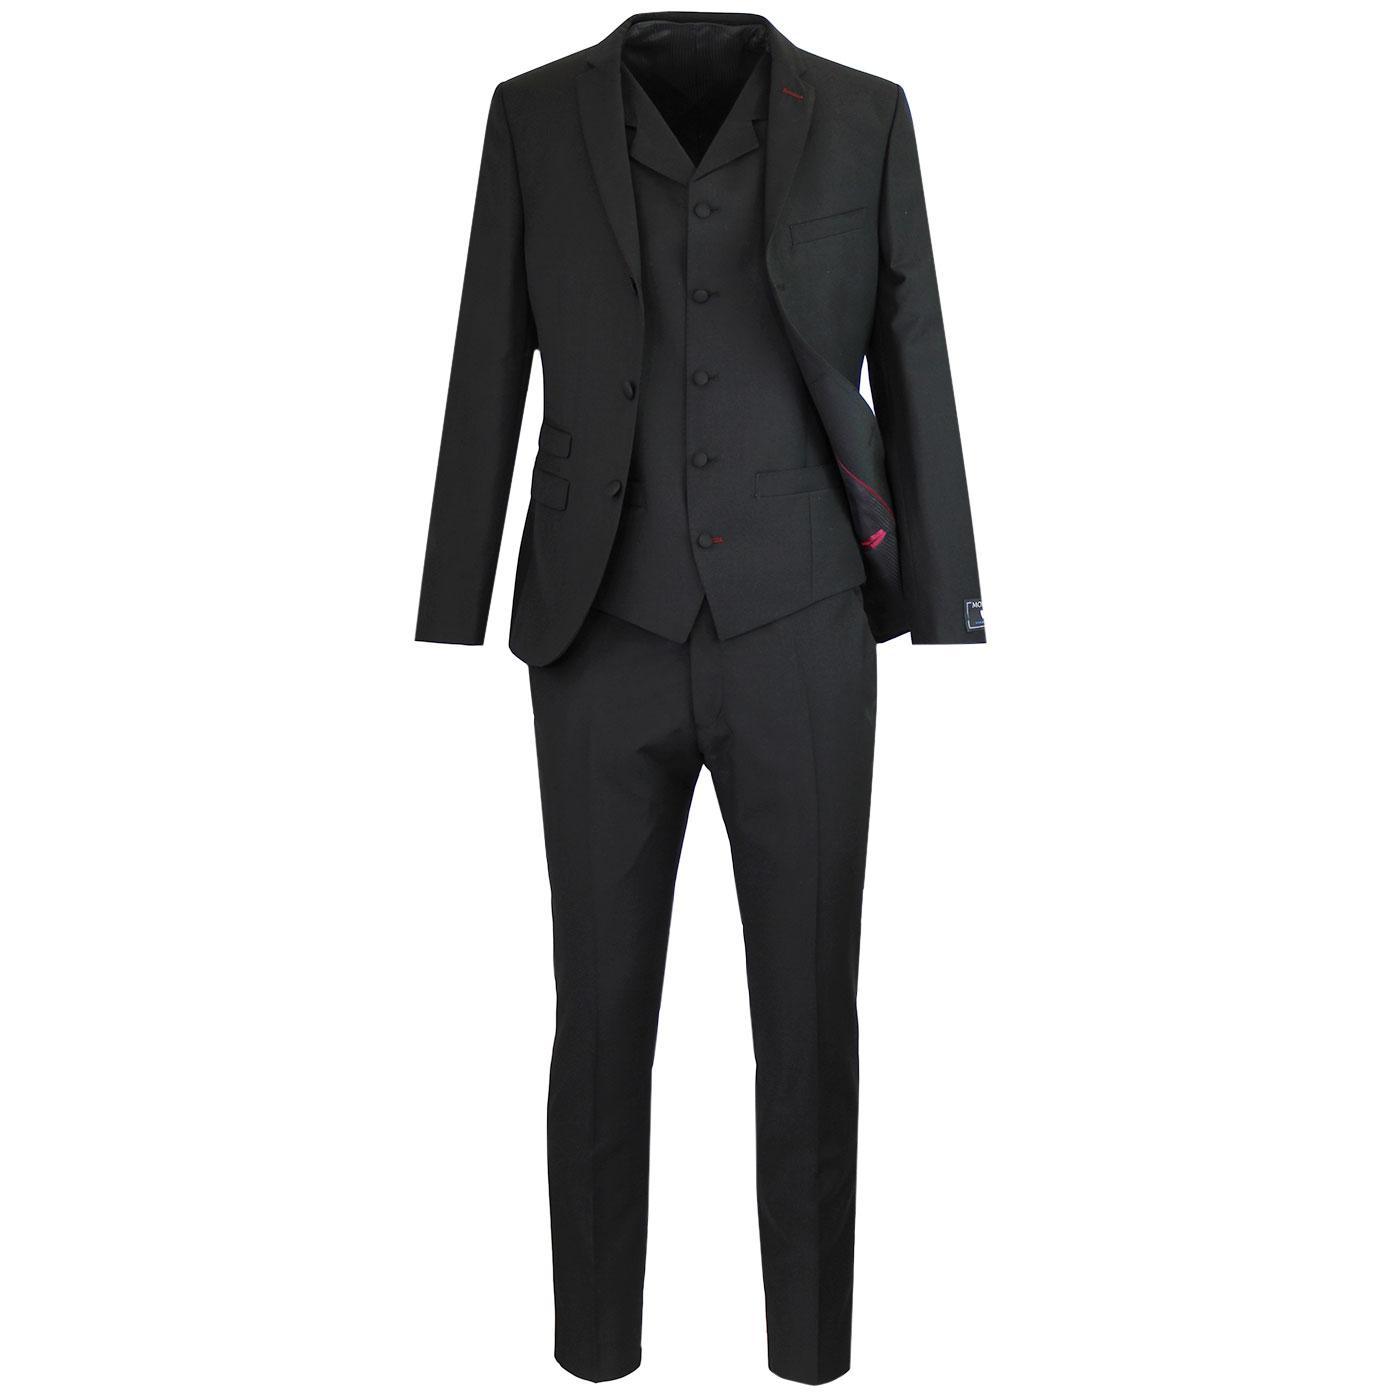 MADCAP ENGLAND 60s Mod Mohair Suit in Black